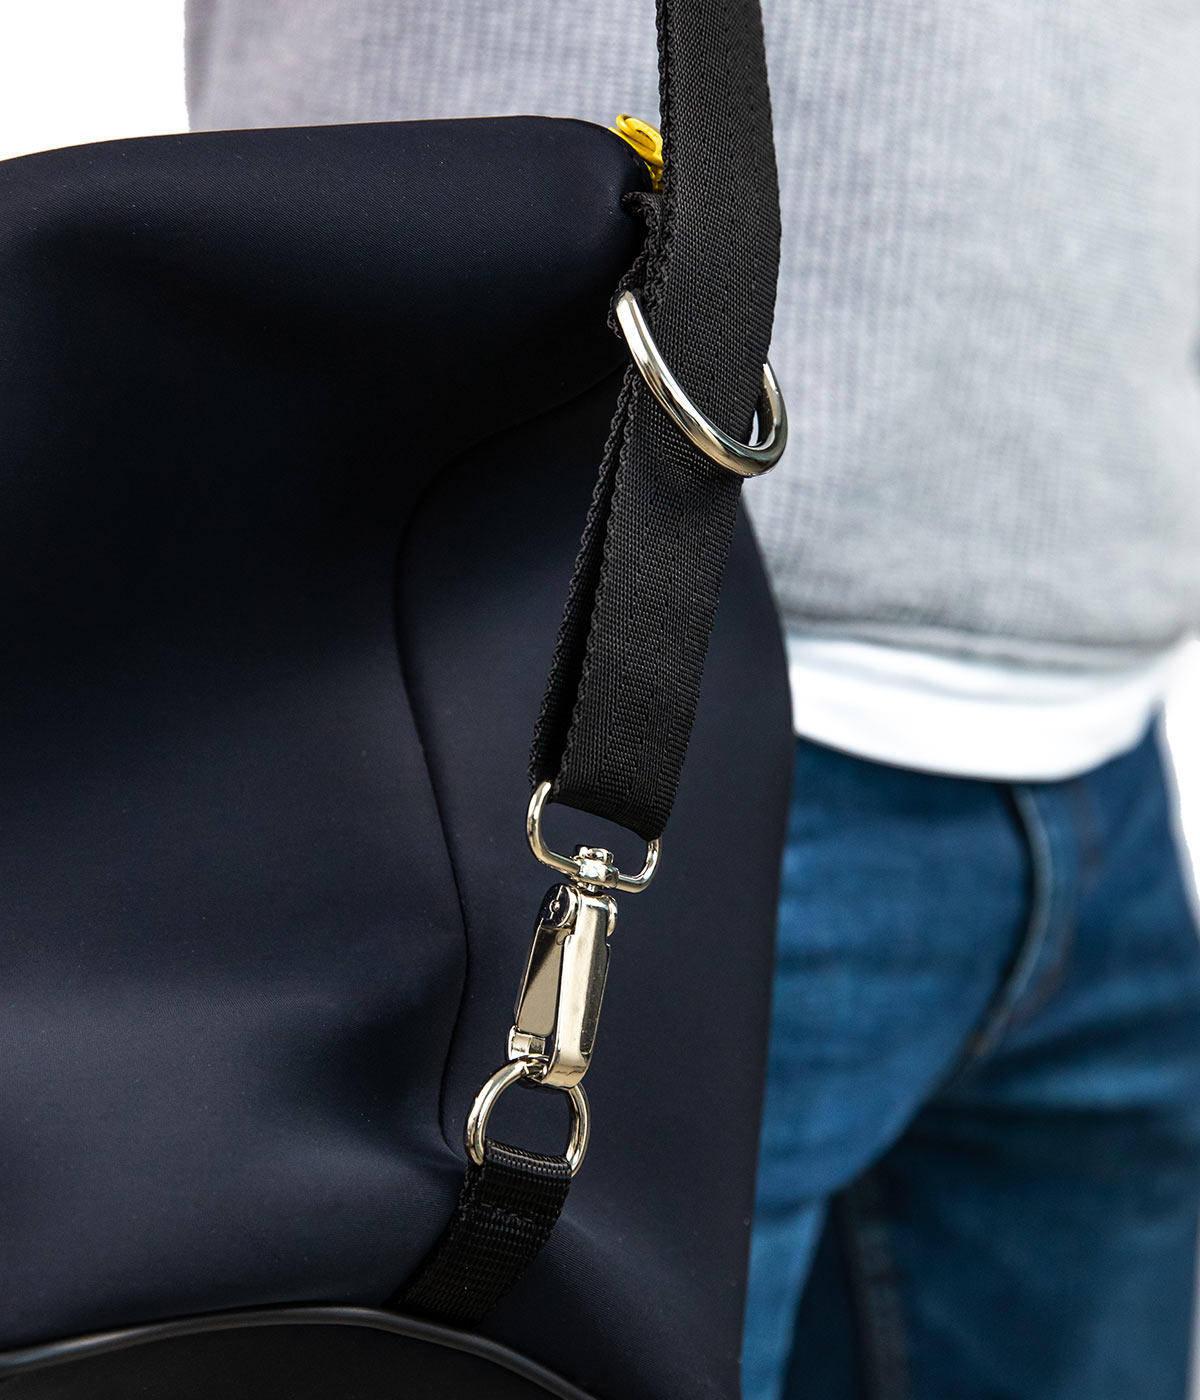 Borsone Neoprene Impermeabile Quitto Bags